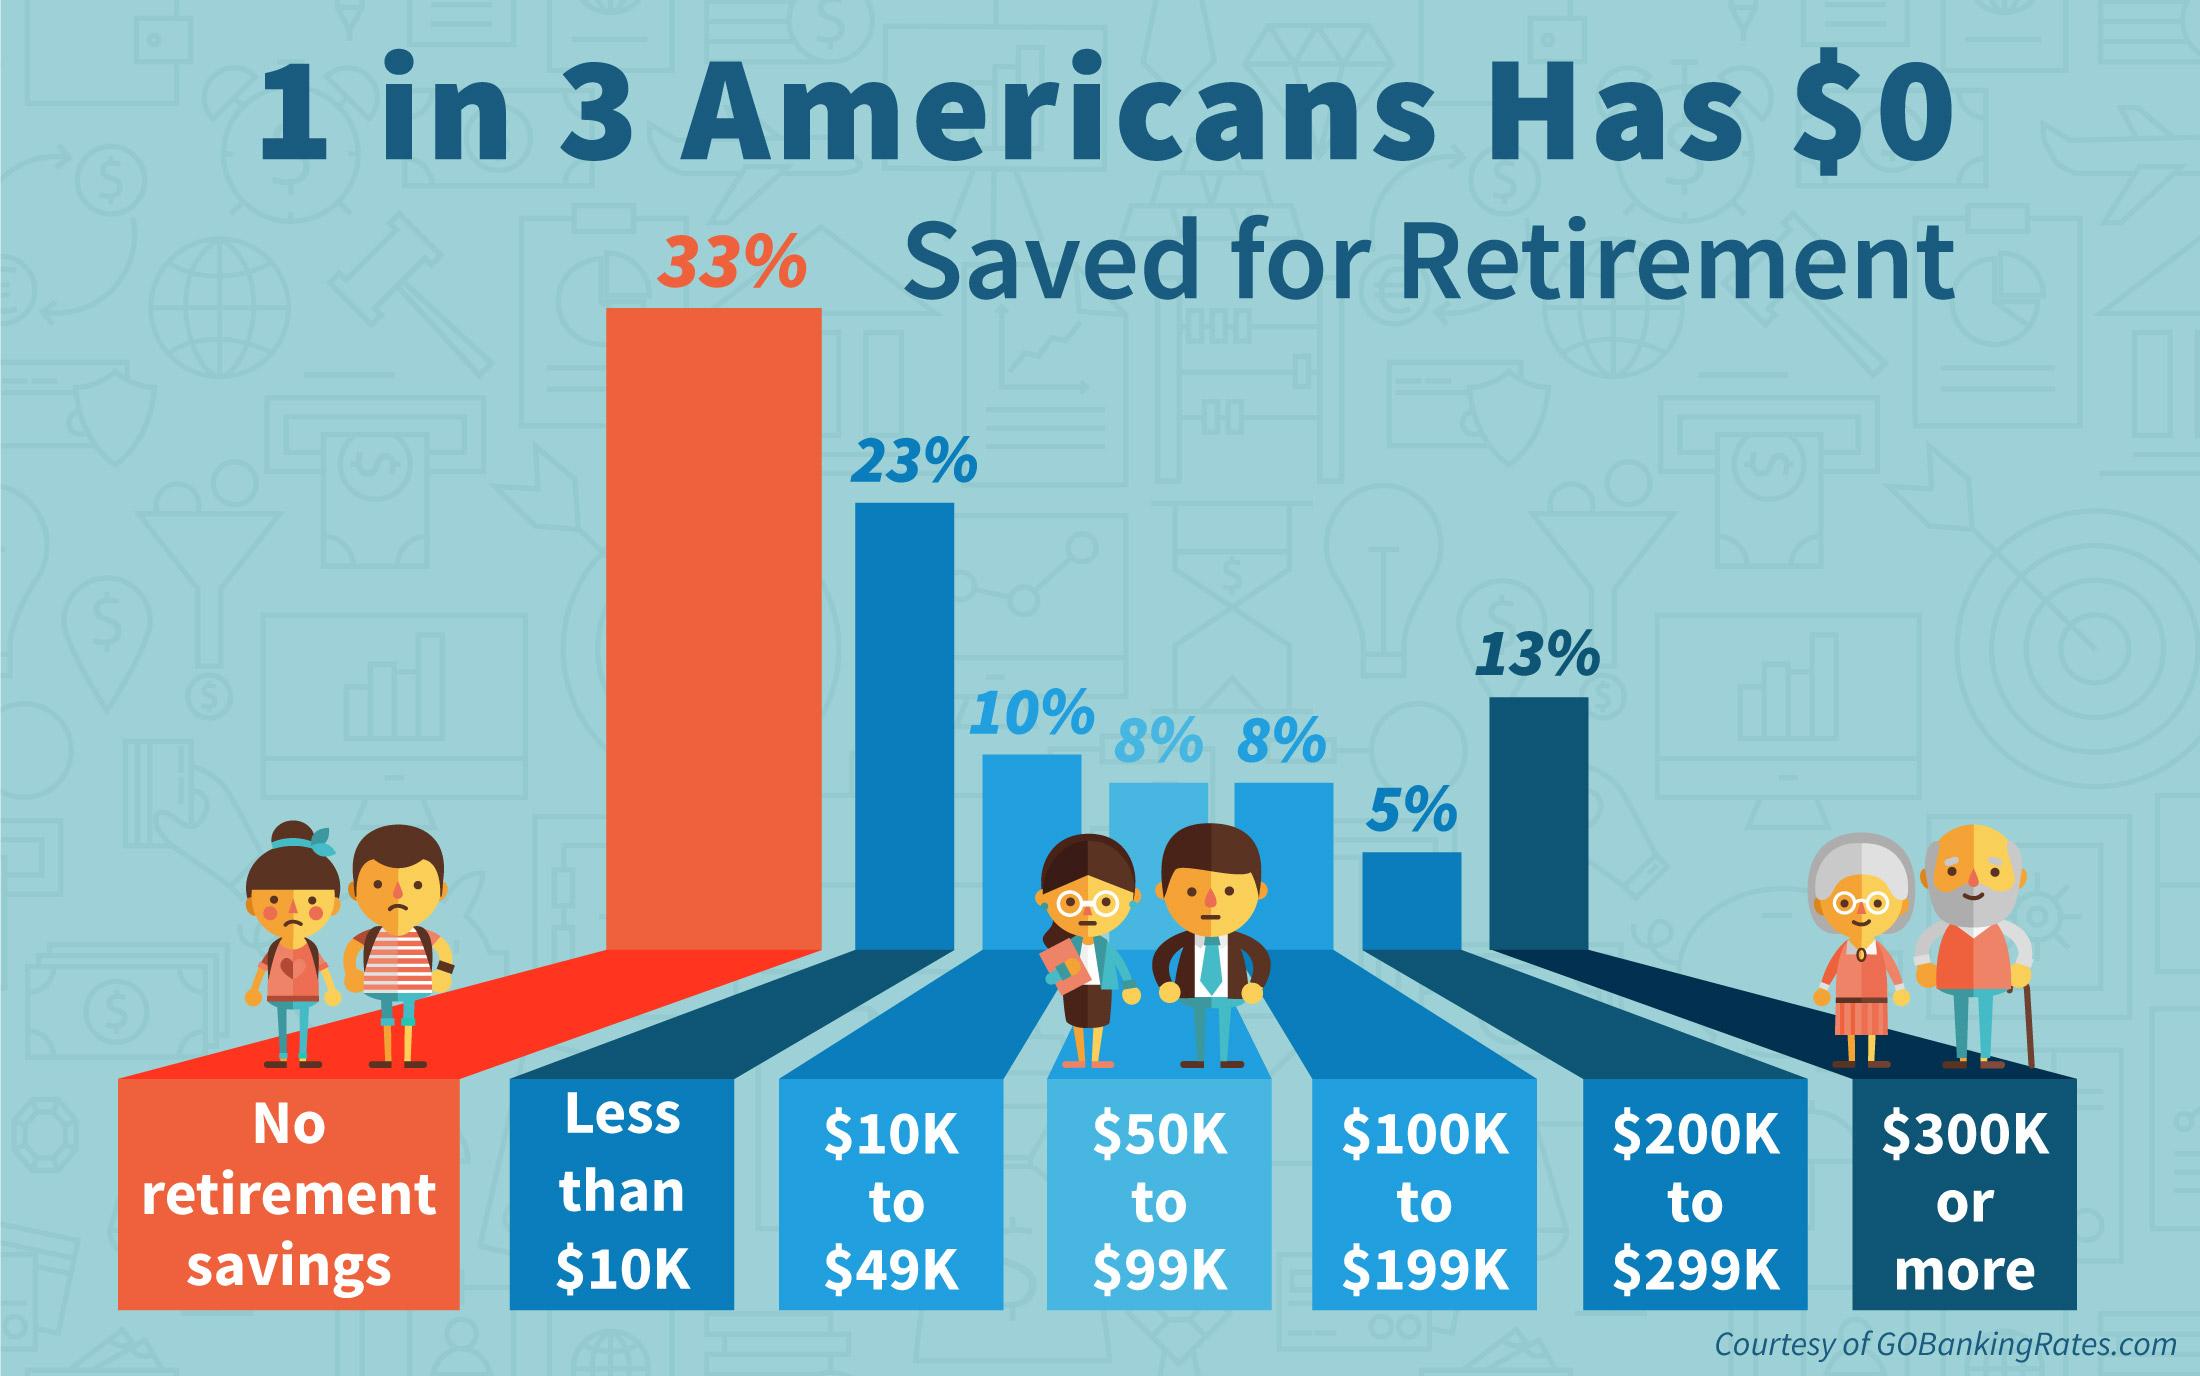 1 In 3 Americans Has No Retirement Savings